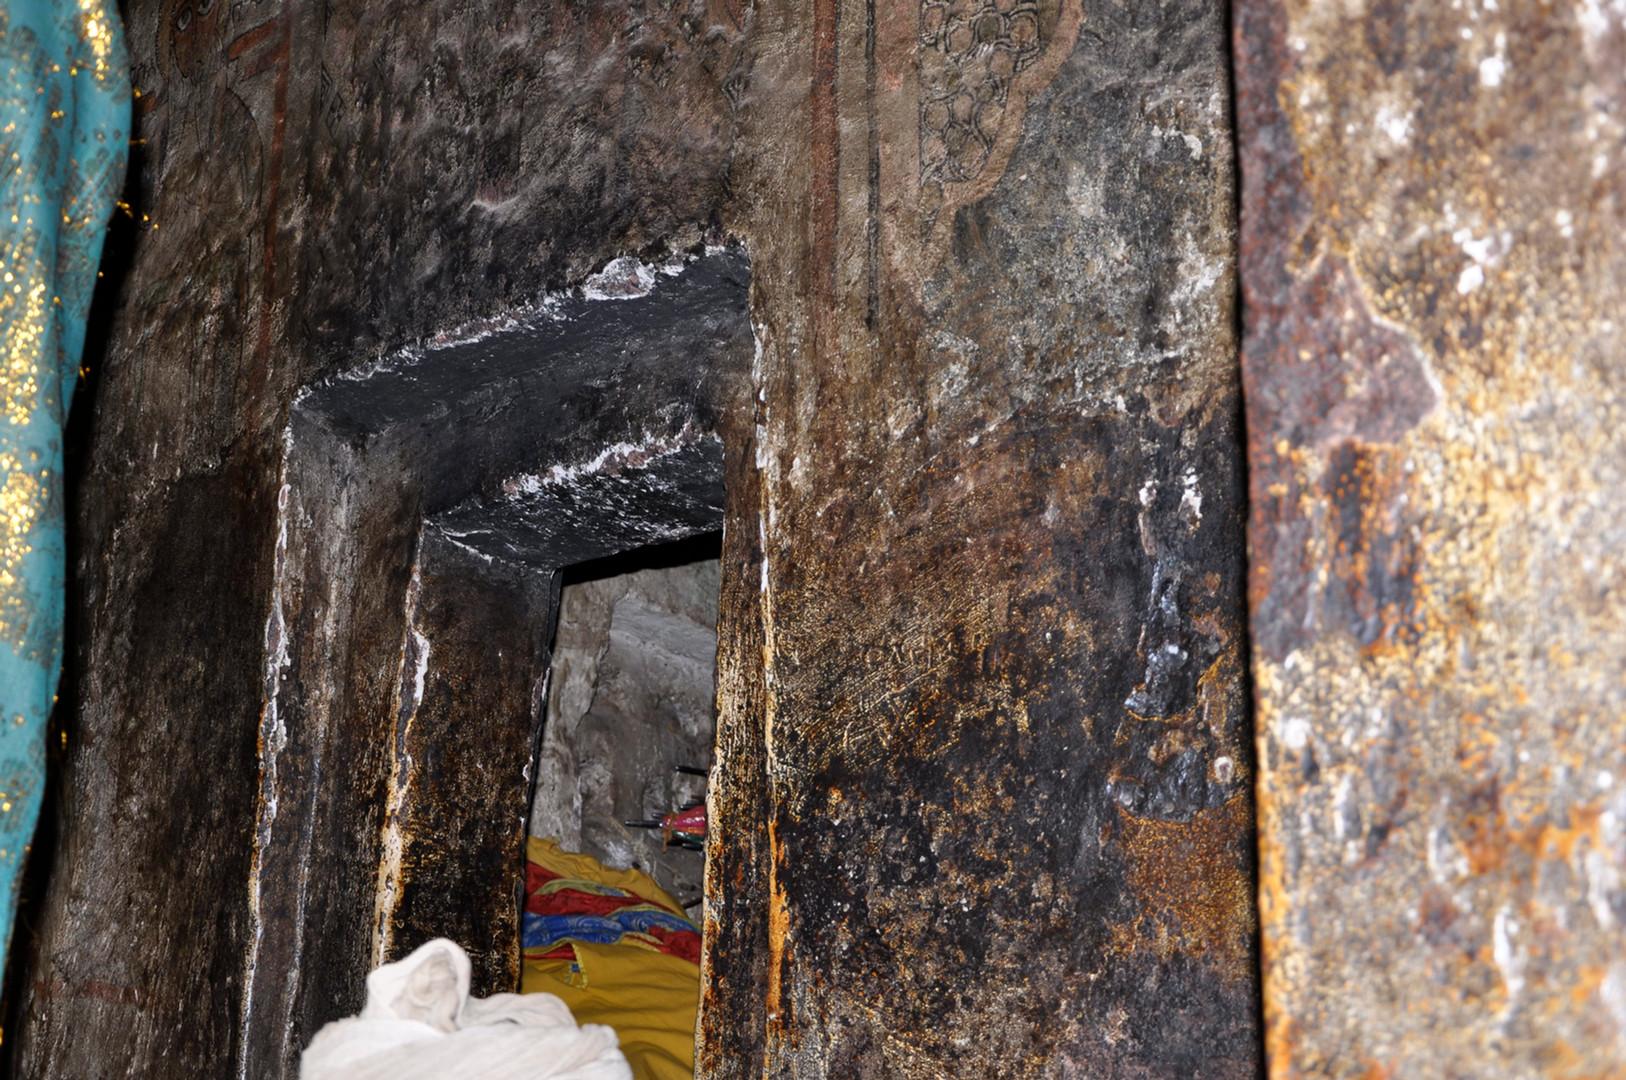 Candle-smoke damage in the sanctuary at Gännätä Maryam